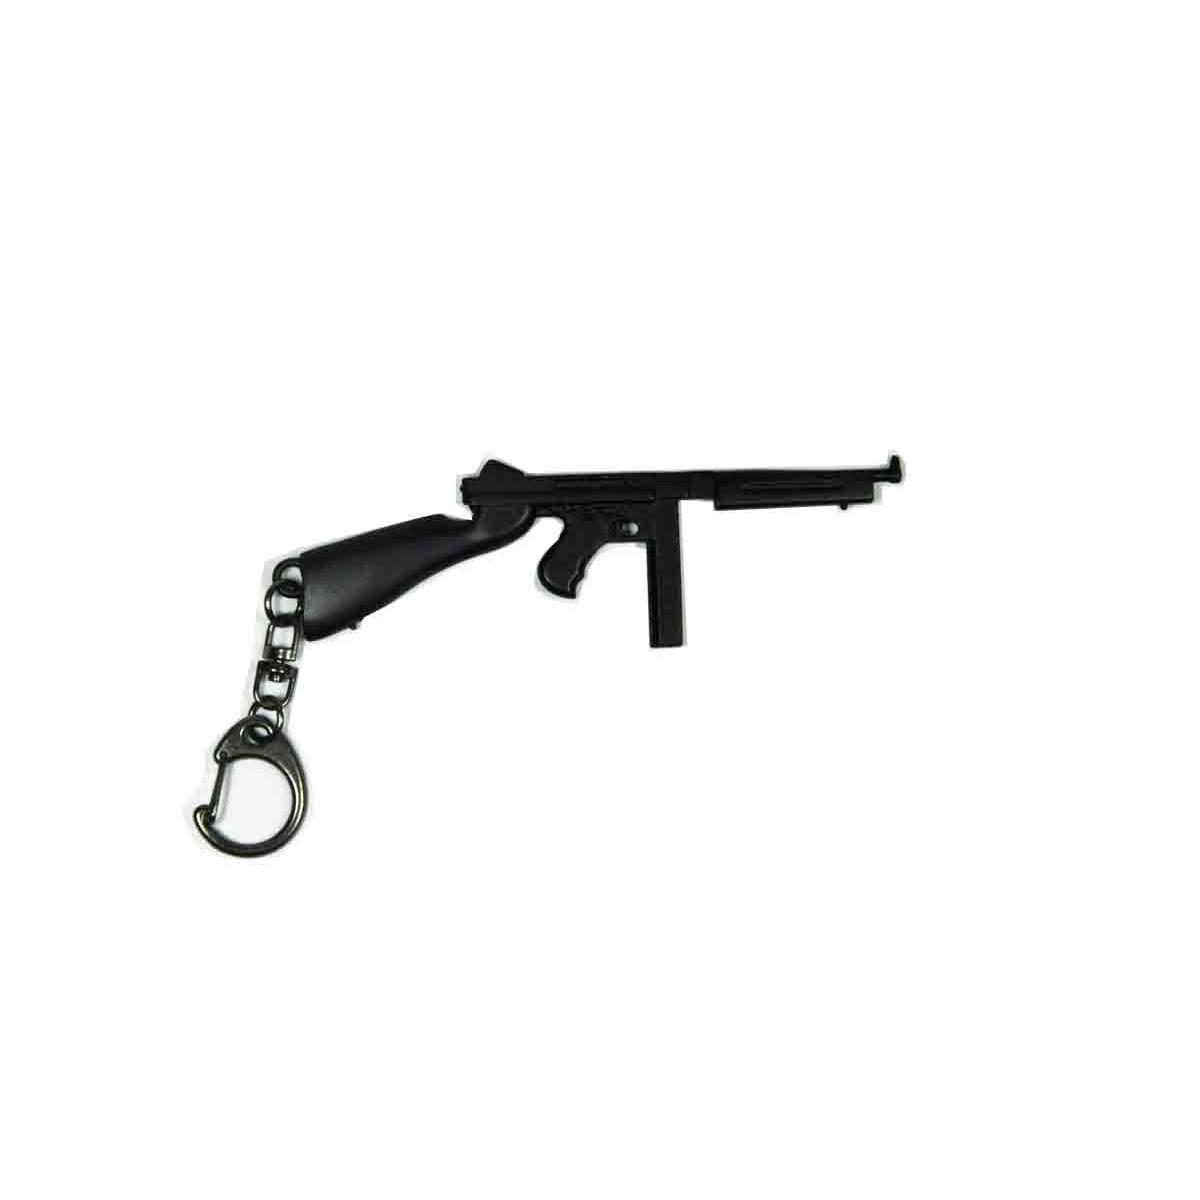 Chaveiro em Metal modelo Rifle Thompson - Arsenal Guns